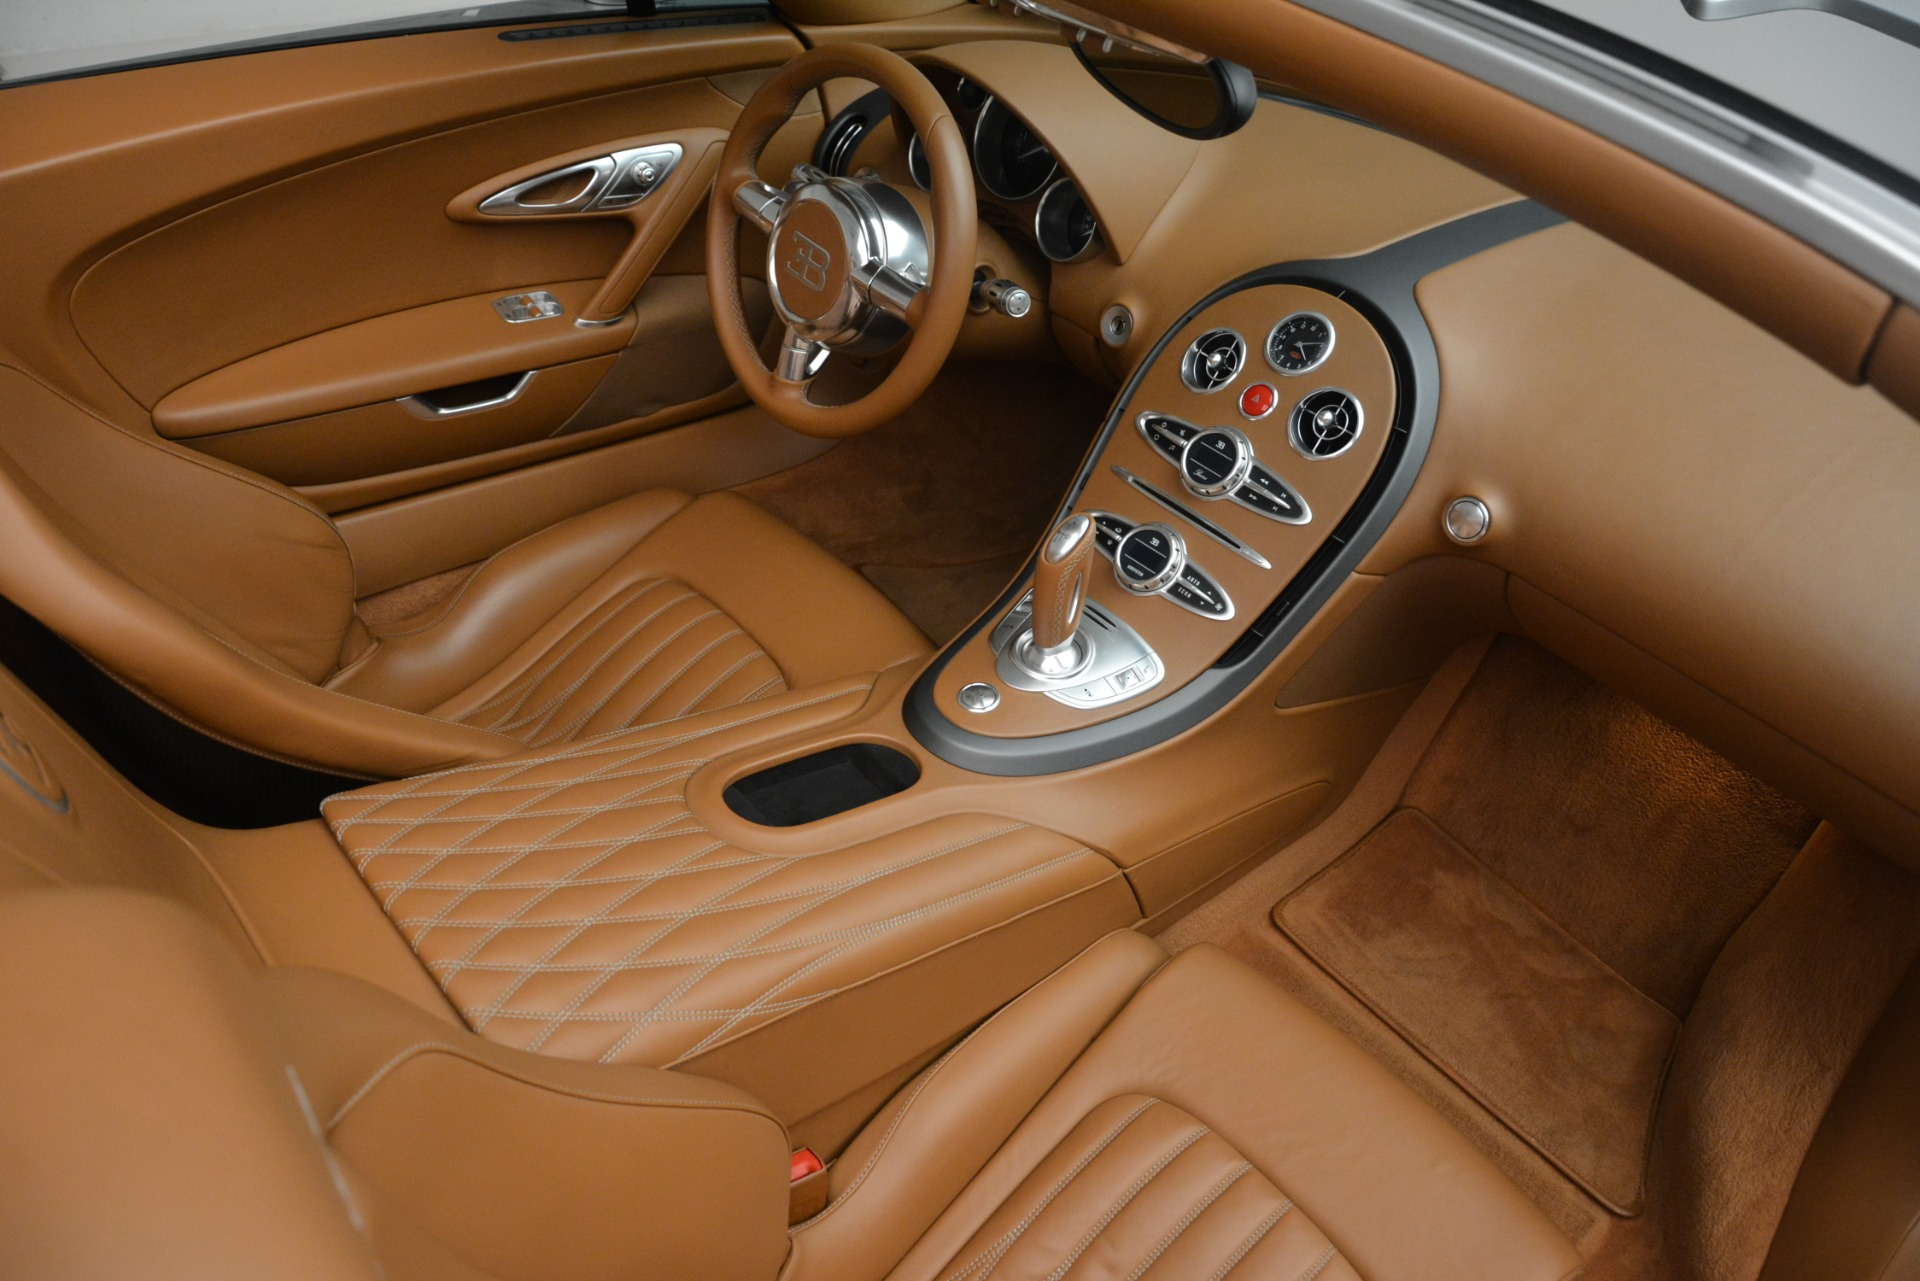 Used 2010 Bugatti Veyron 16.4 Grand Sport For Sale In Greenwich, CT 3159_p33